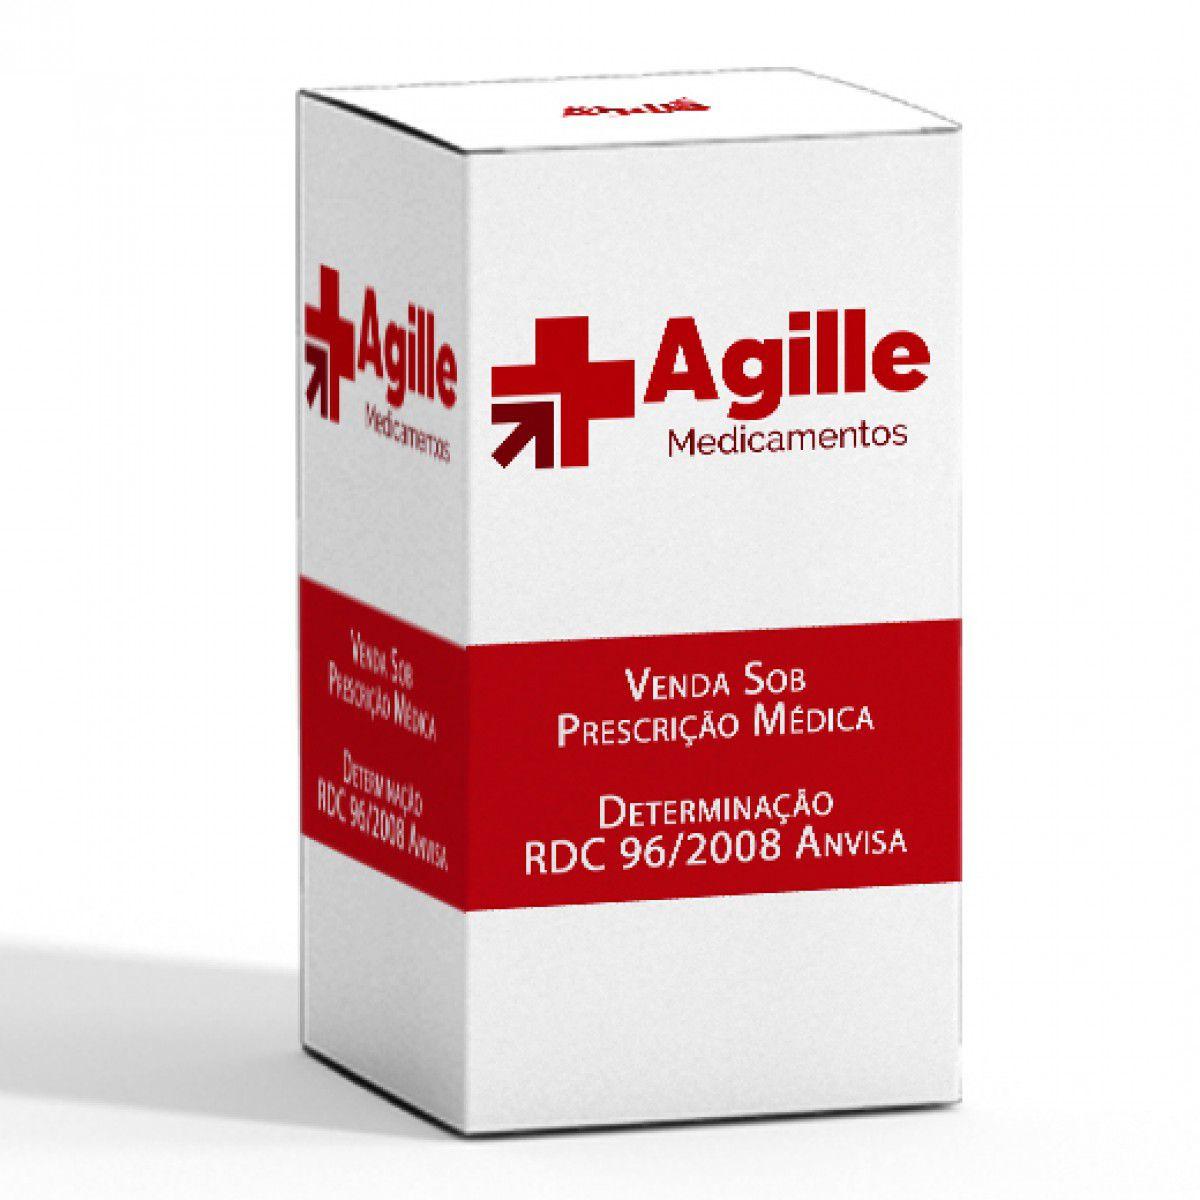 SANDOSTATIN LAR MPVI 20MG INJ FA + SER 2,5ML S/APLIC  - Agille Speciality